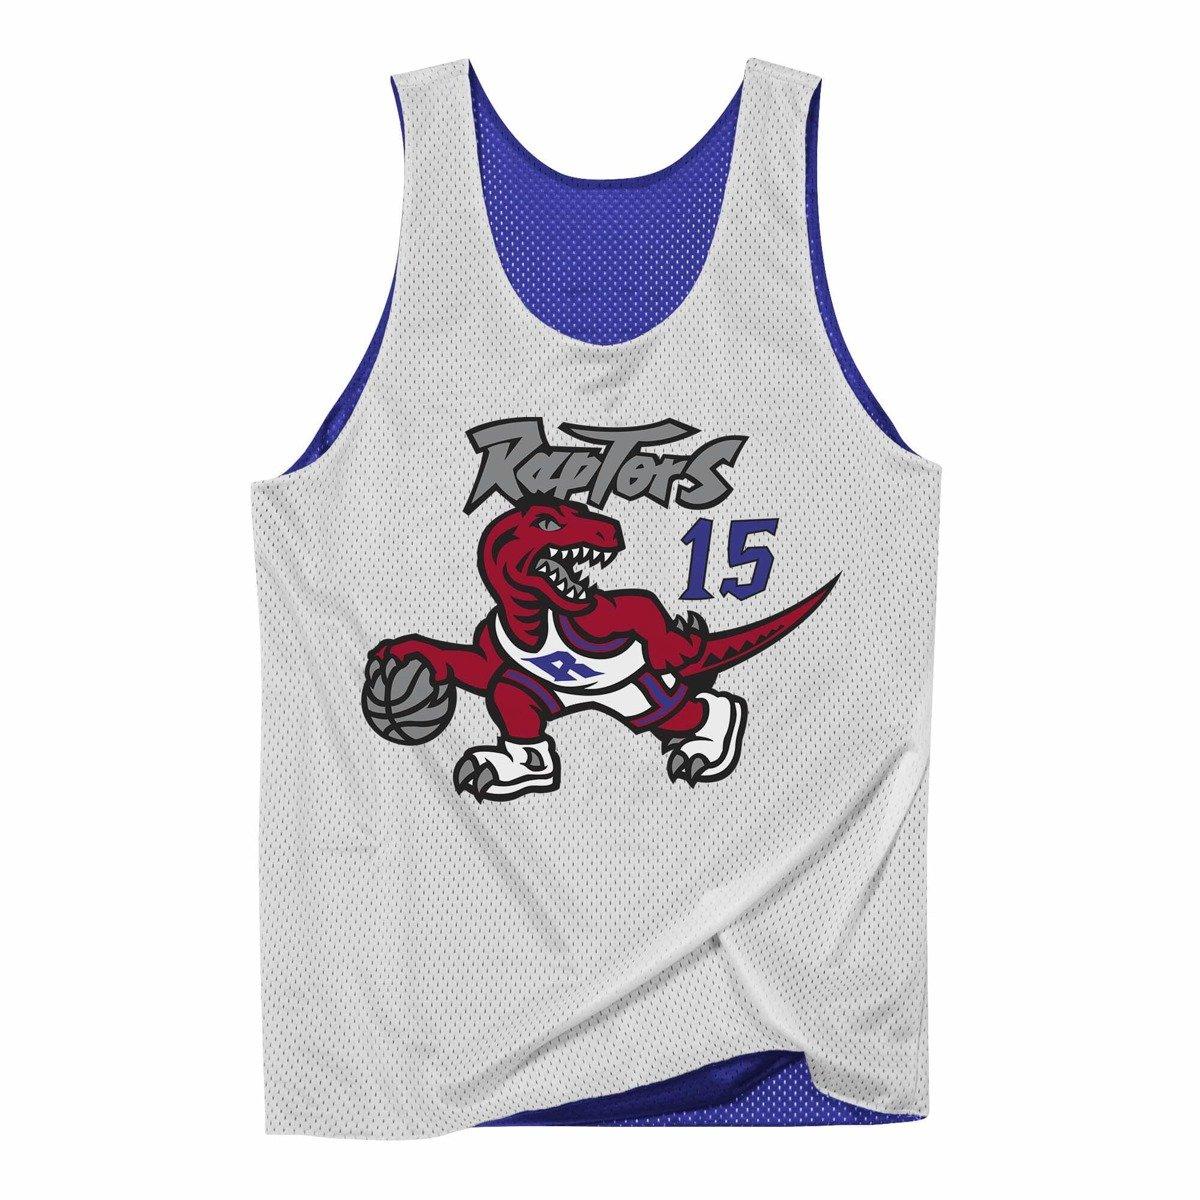 innovative design de6a8 4ad84 Mitchell & Ness NBA Reversible Mesh Tank Toronto Raptors Vince Carter -  NNRMDA18007-TRAPRWH1VCA98